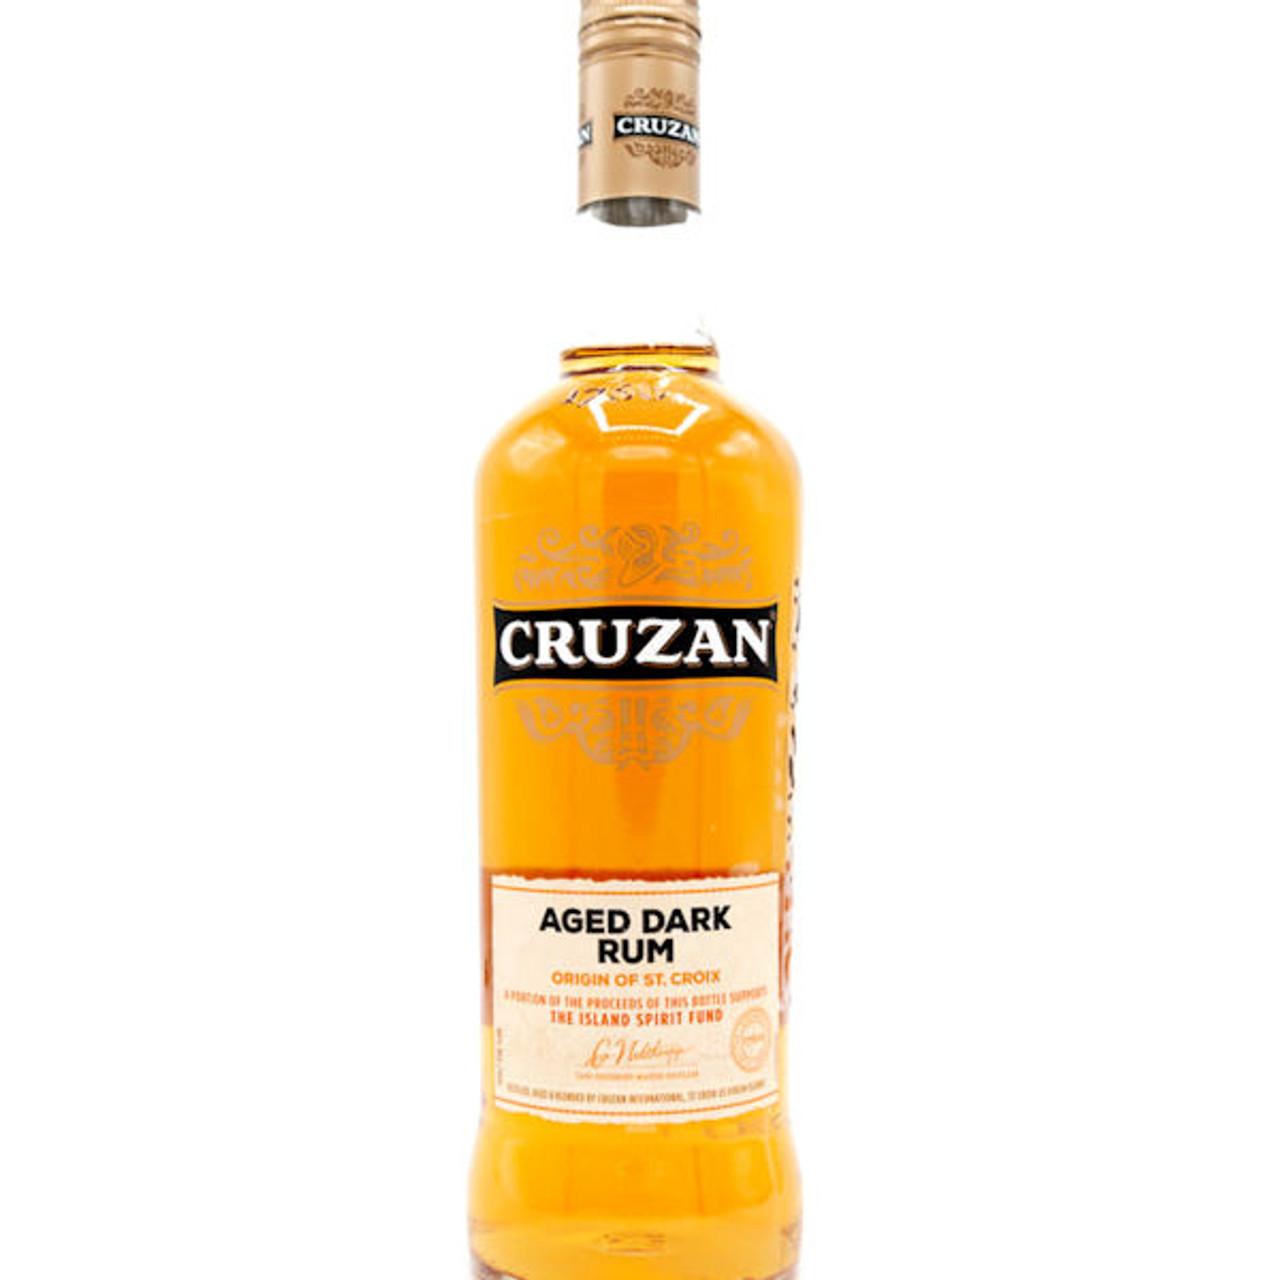 Cruzan Estates Aged Dark Rum St. Croix 750ml